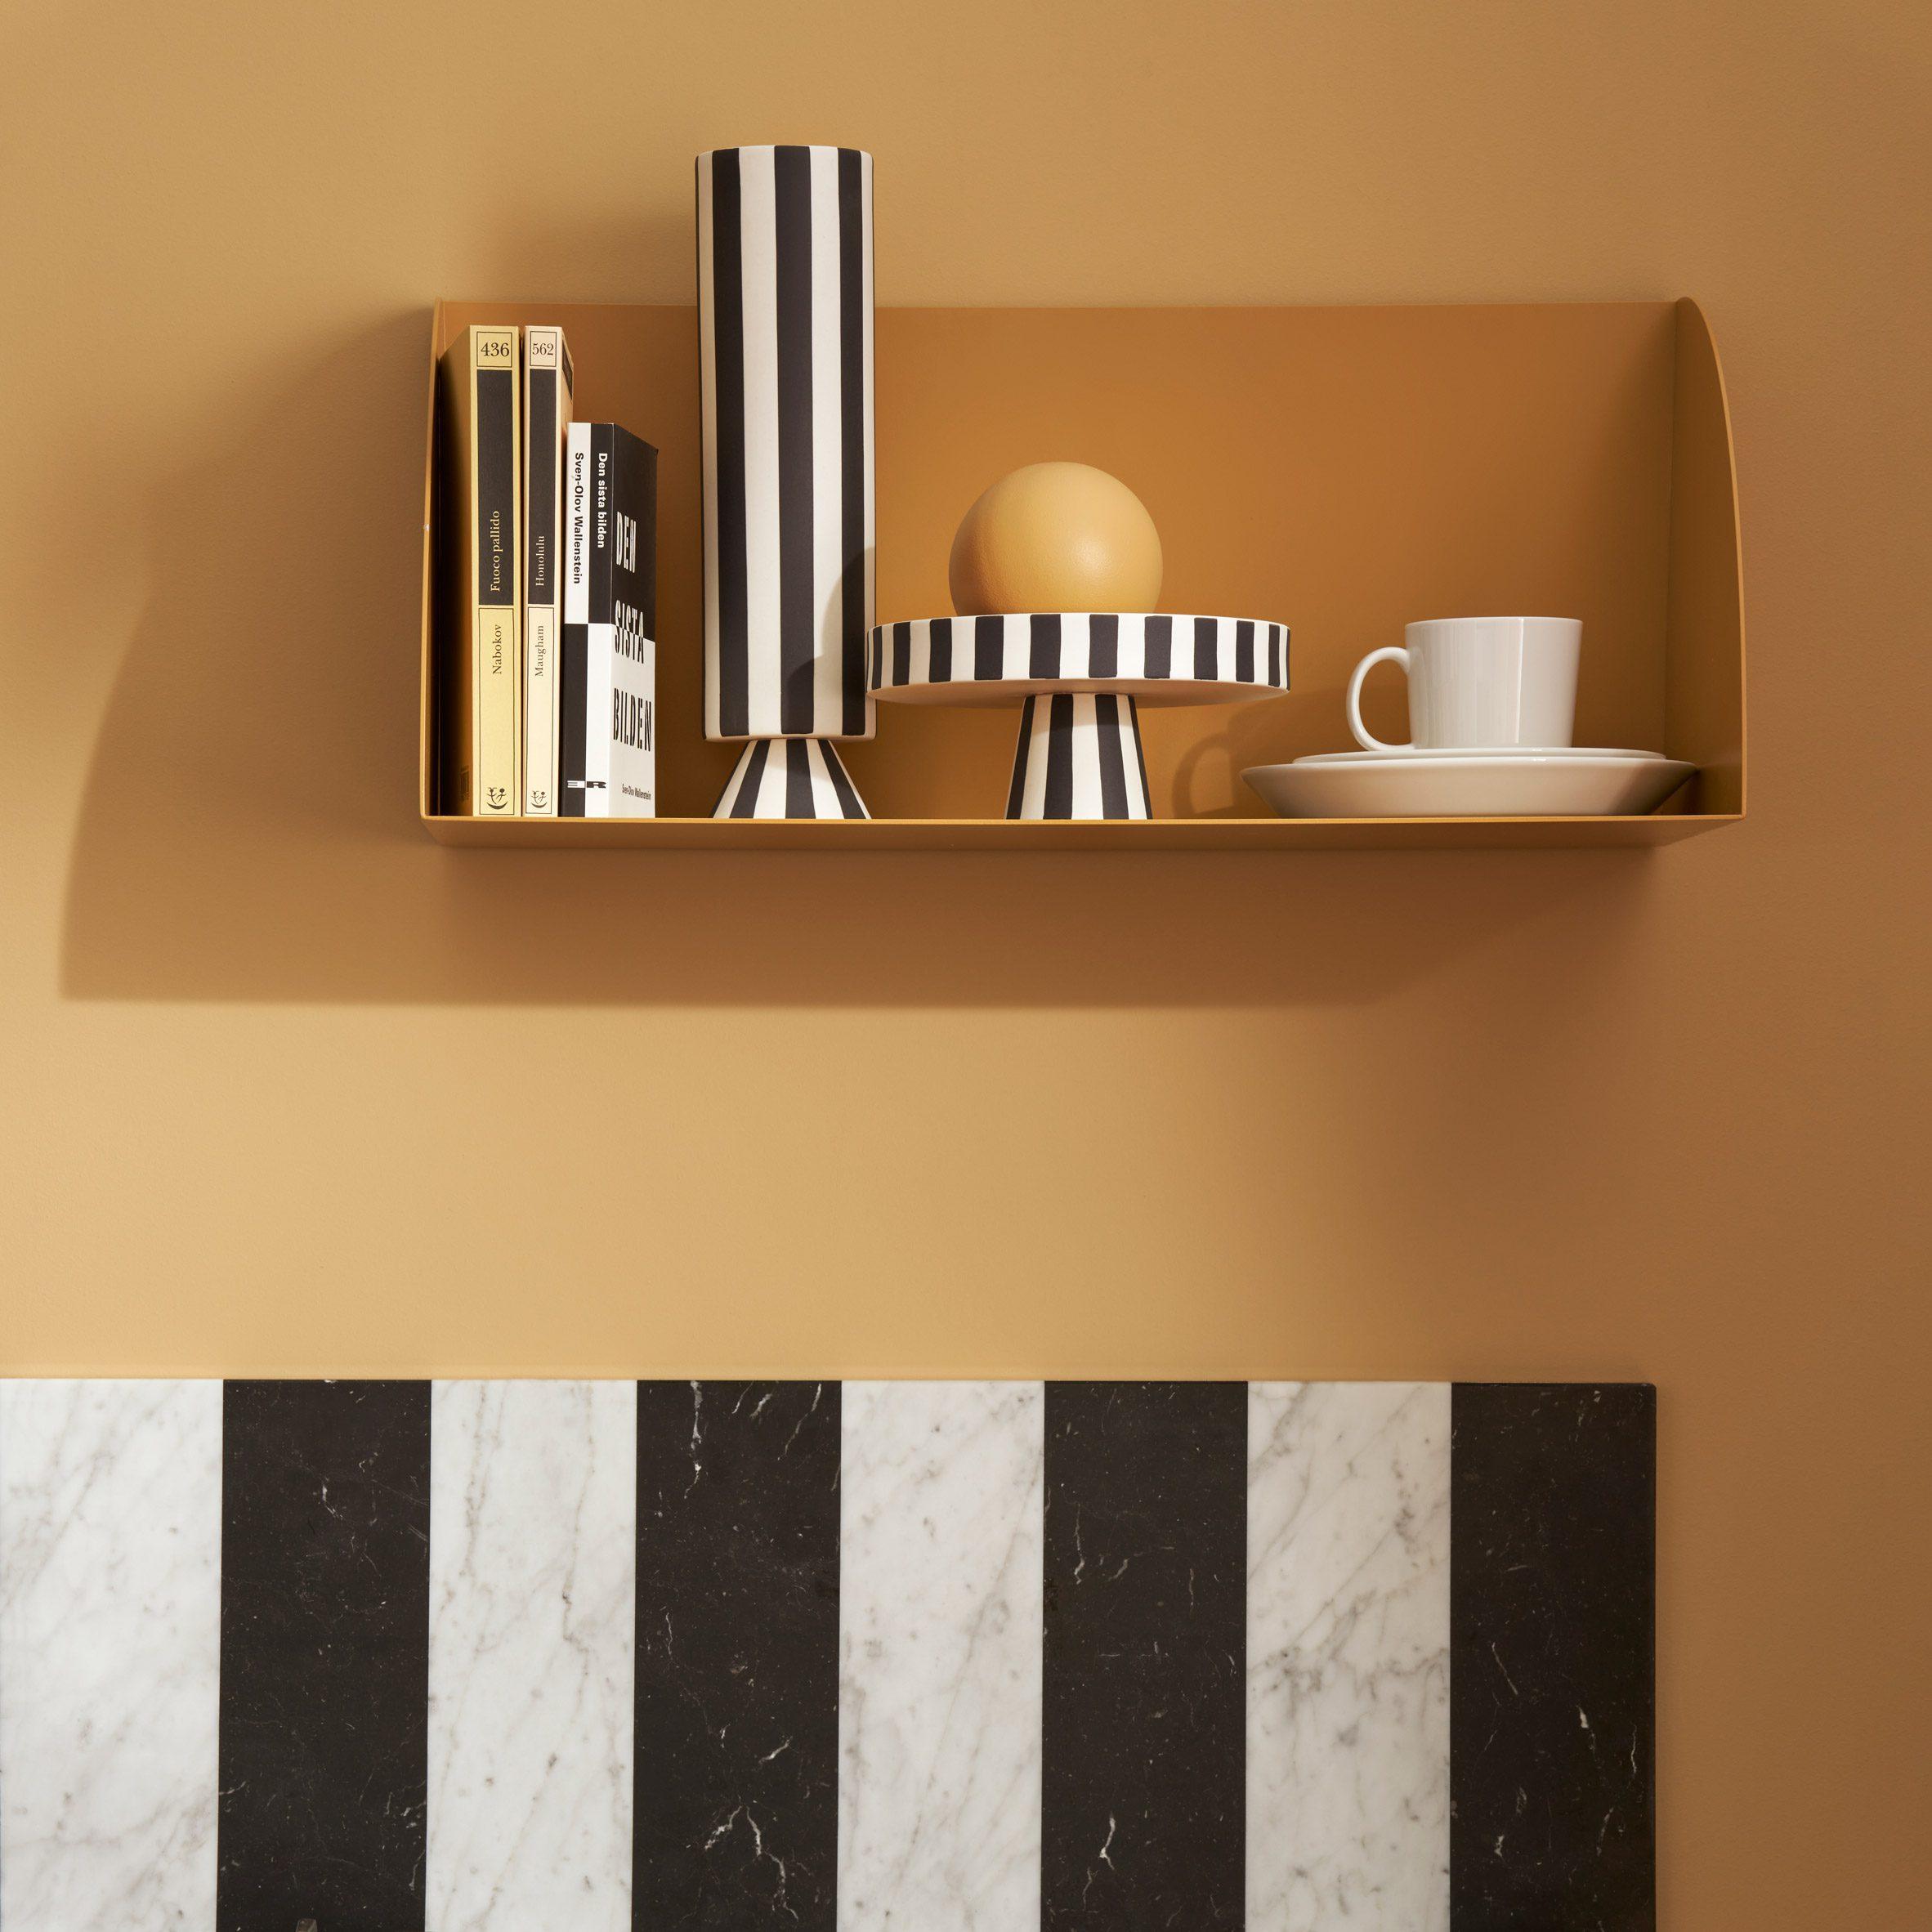 A yellow shelf above a marble countertop